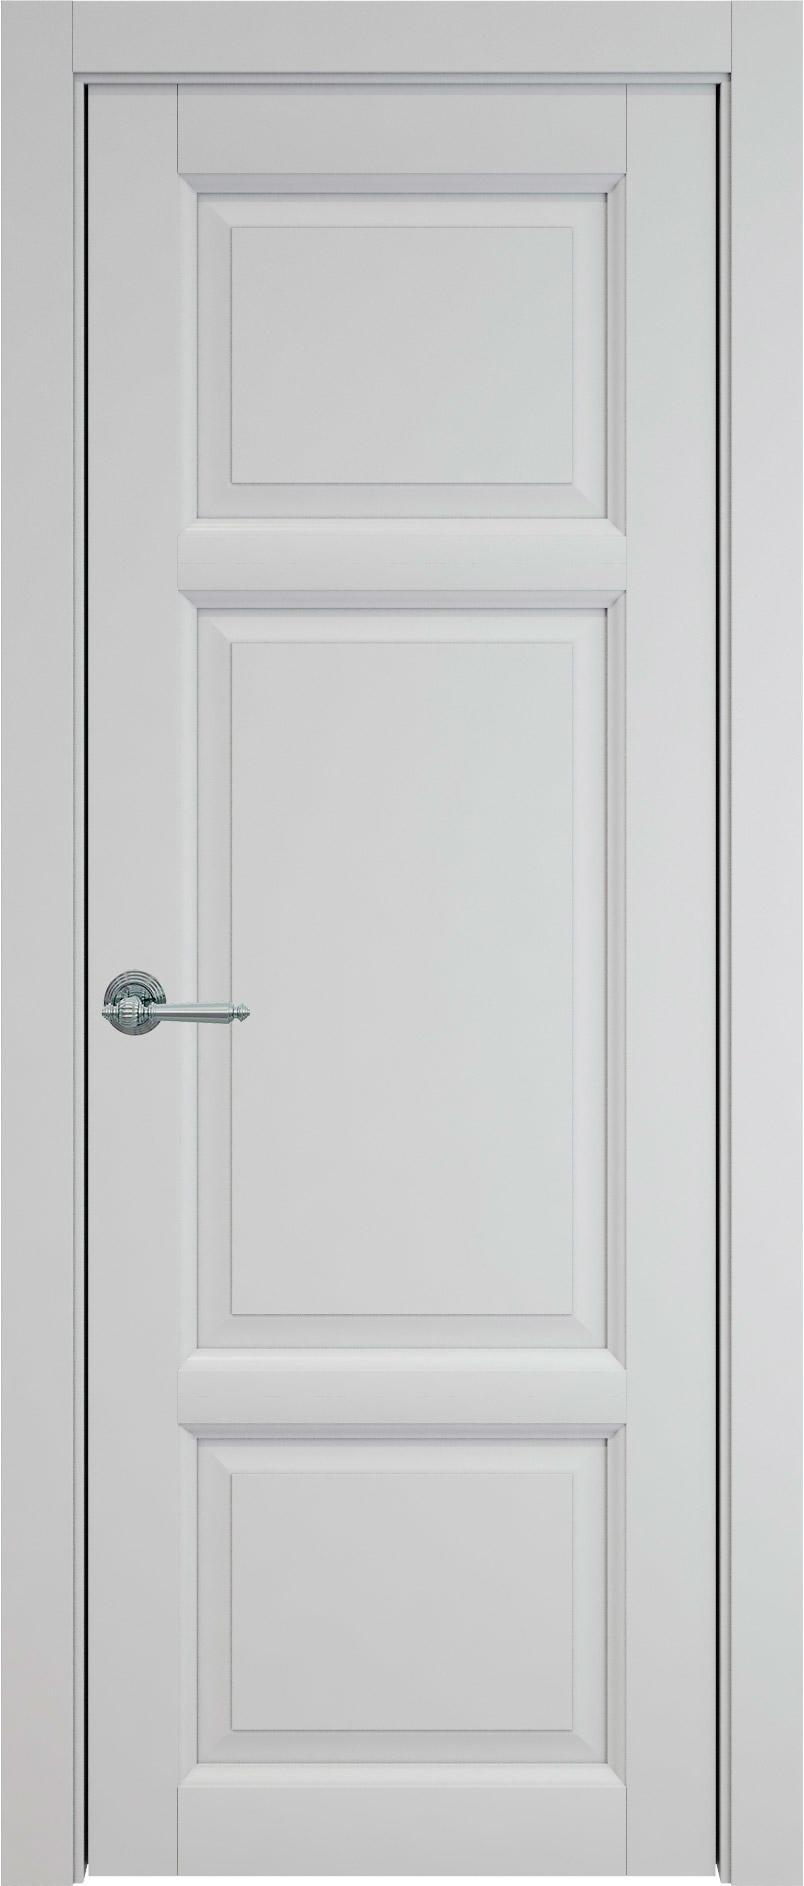 Siena цвет - Серая эмаль (RAL 7047) Без стекла (ДГ)